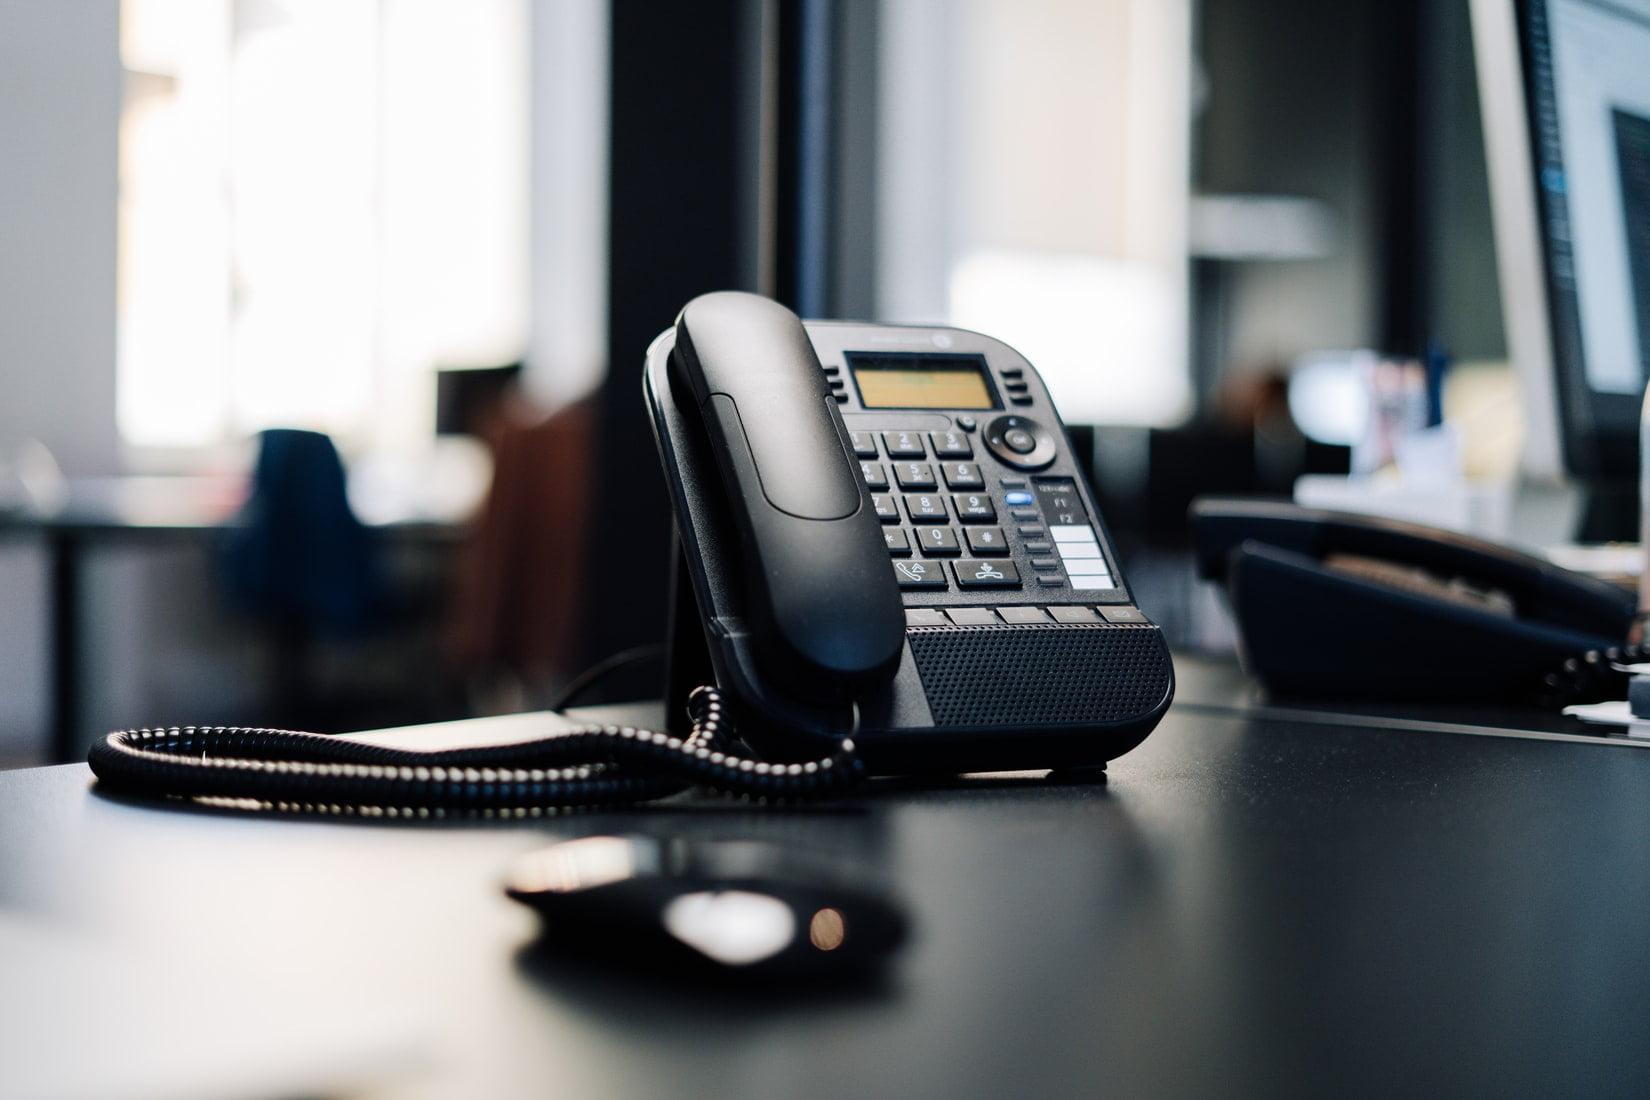 Phone on office desk